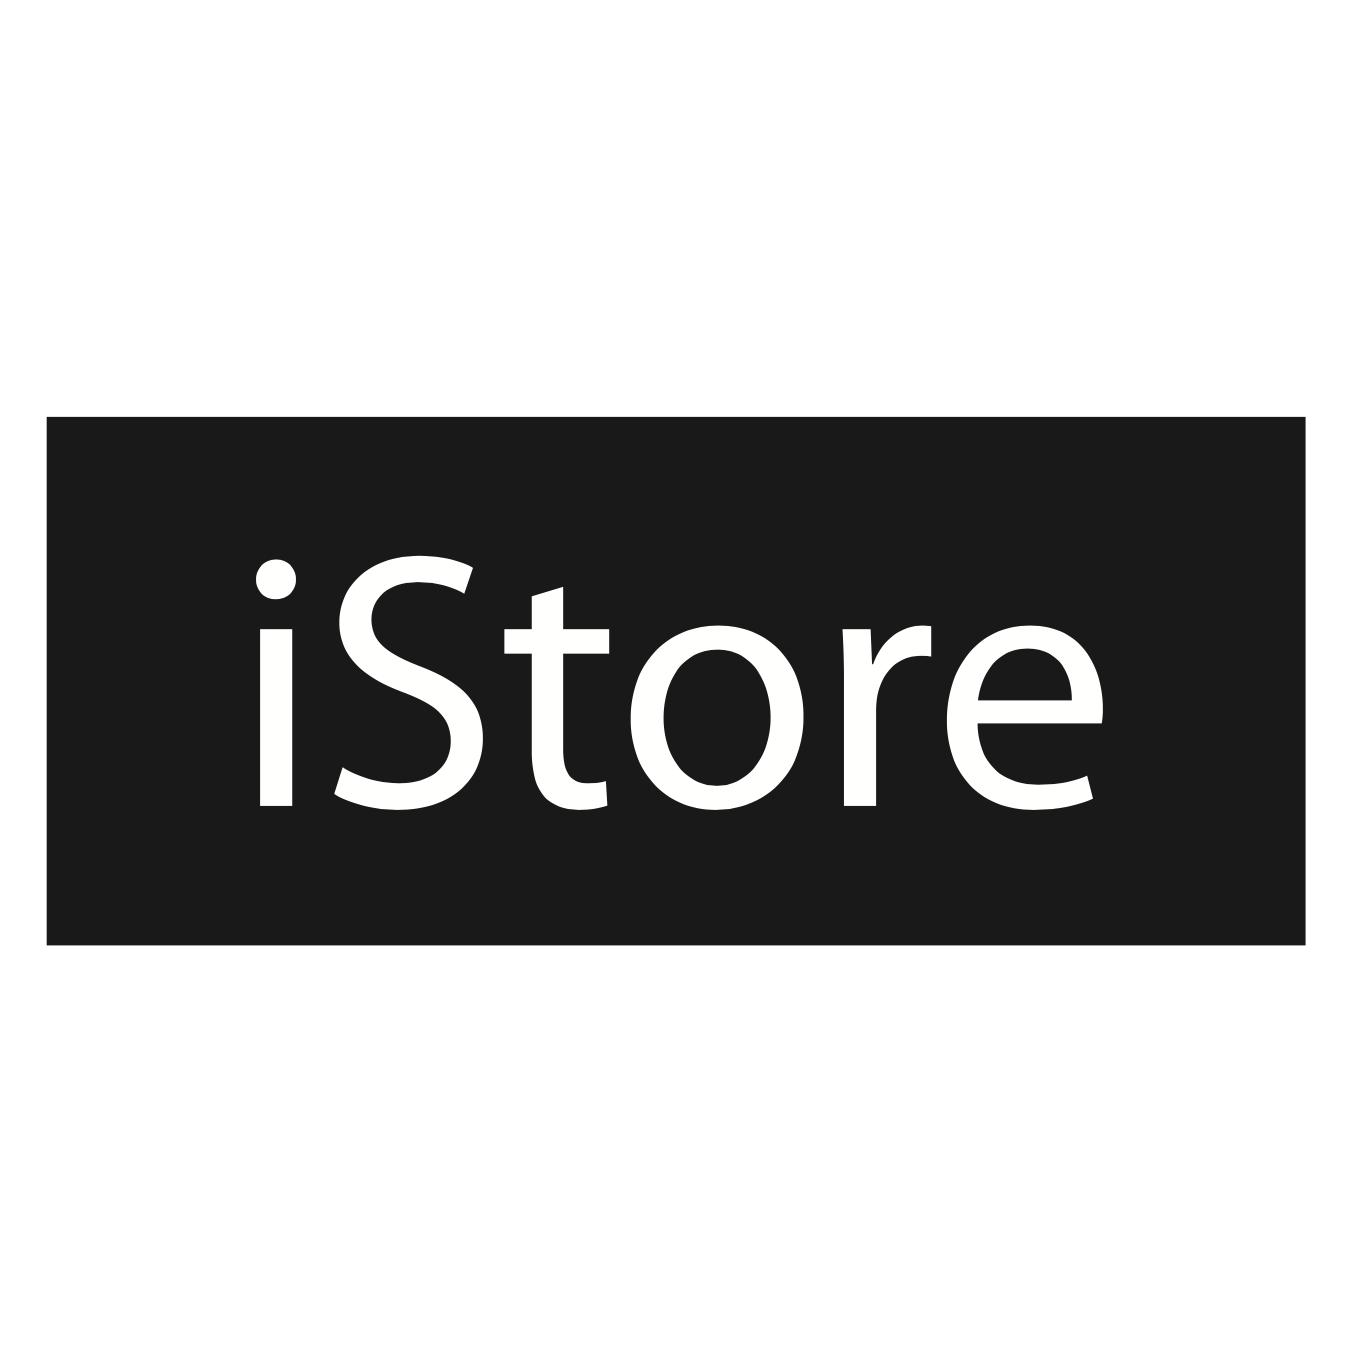 12-inch MacBook 1.1GHZ Core m3 256GB - Space Grey